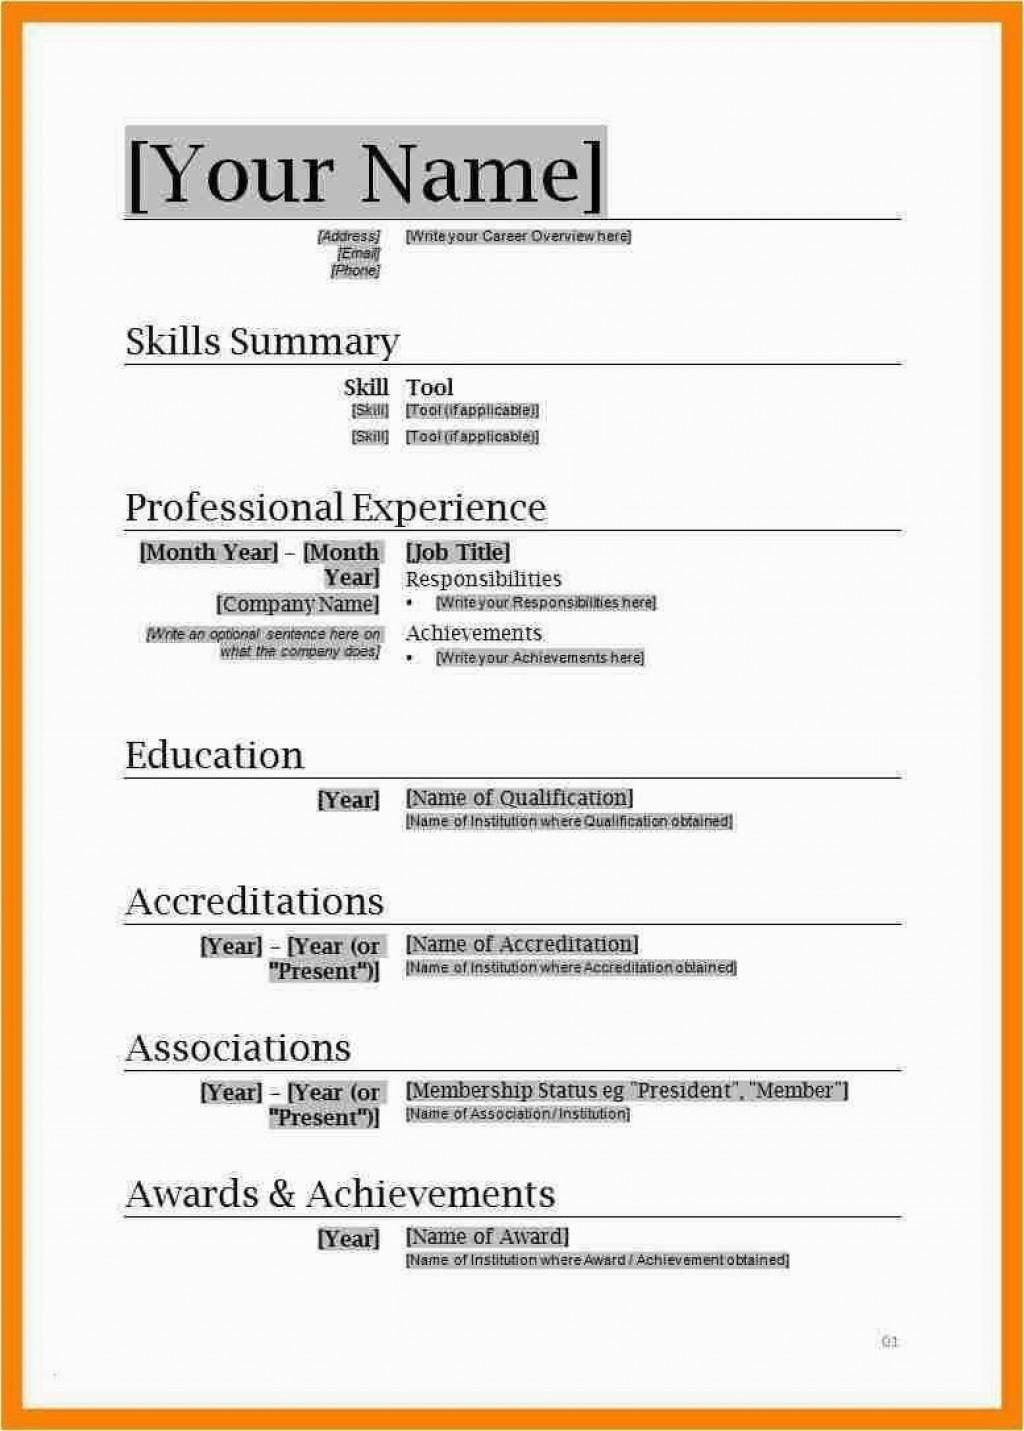 001 Unusual Free Simple Resume Template Microsoft Word Image Large